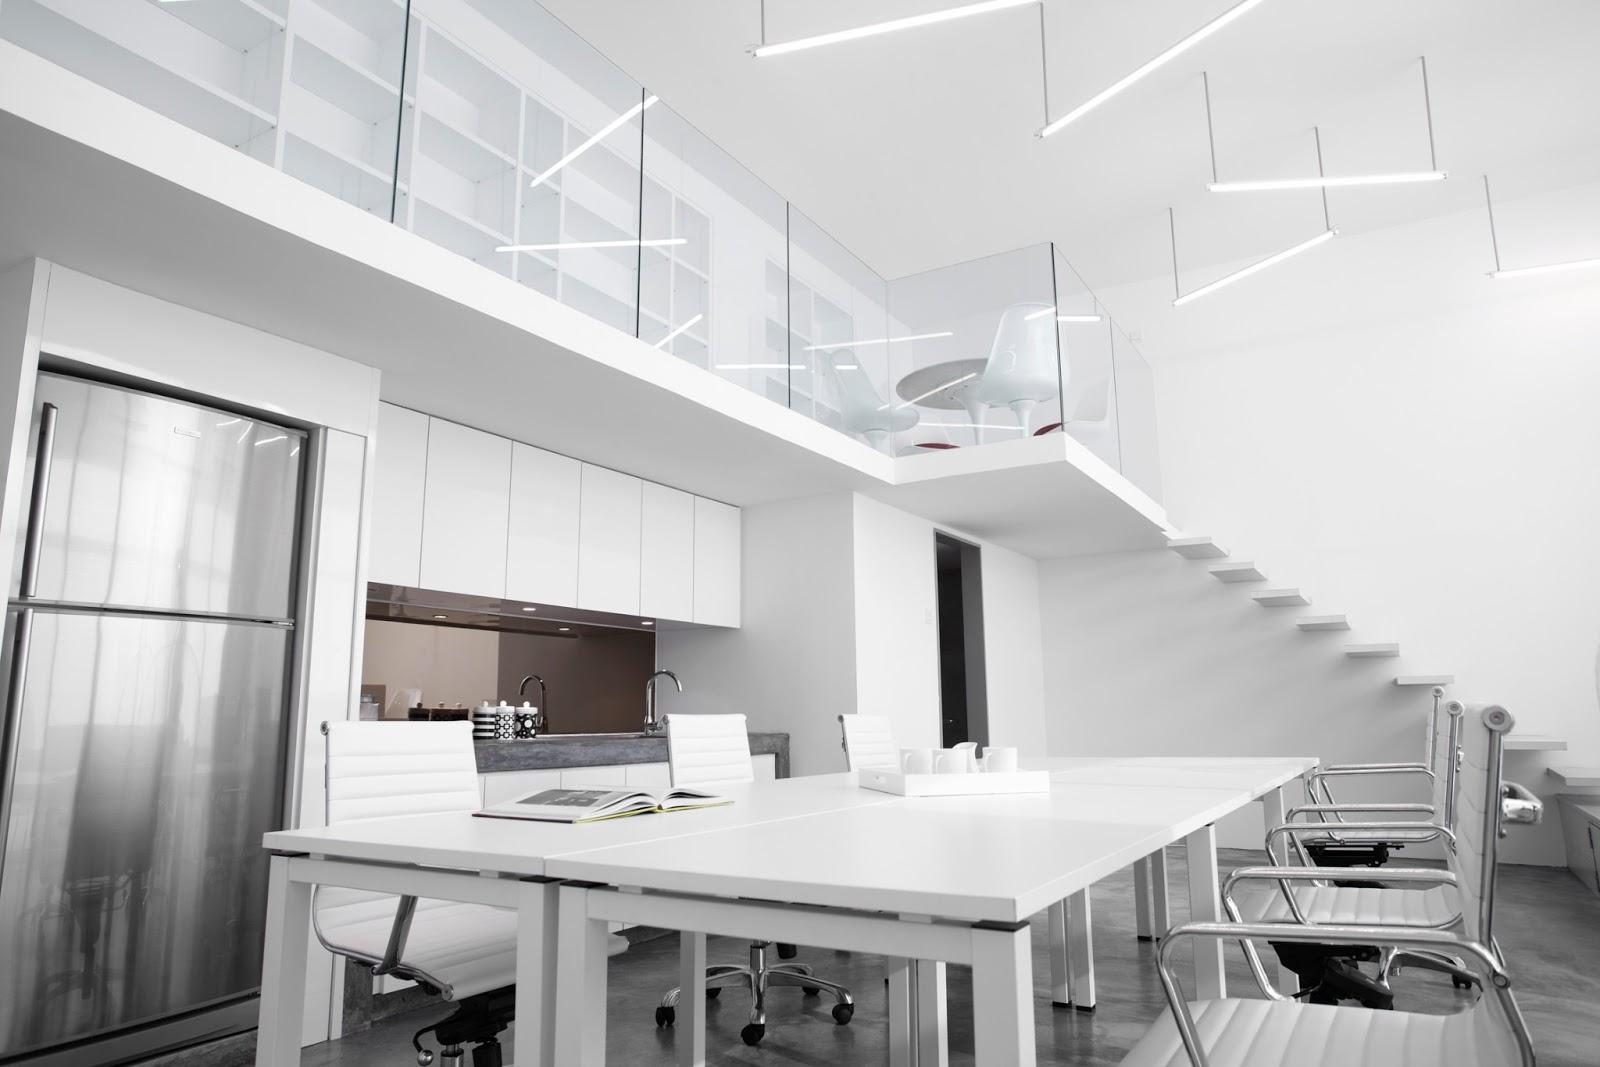 Dex loft in kuala lumpur wins corporate office award for Loft office design